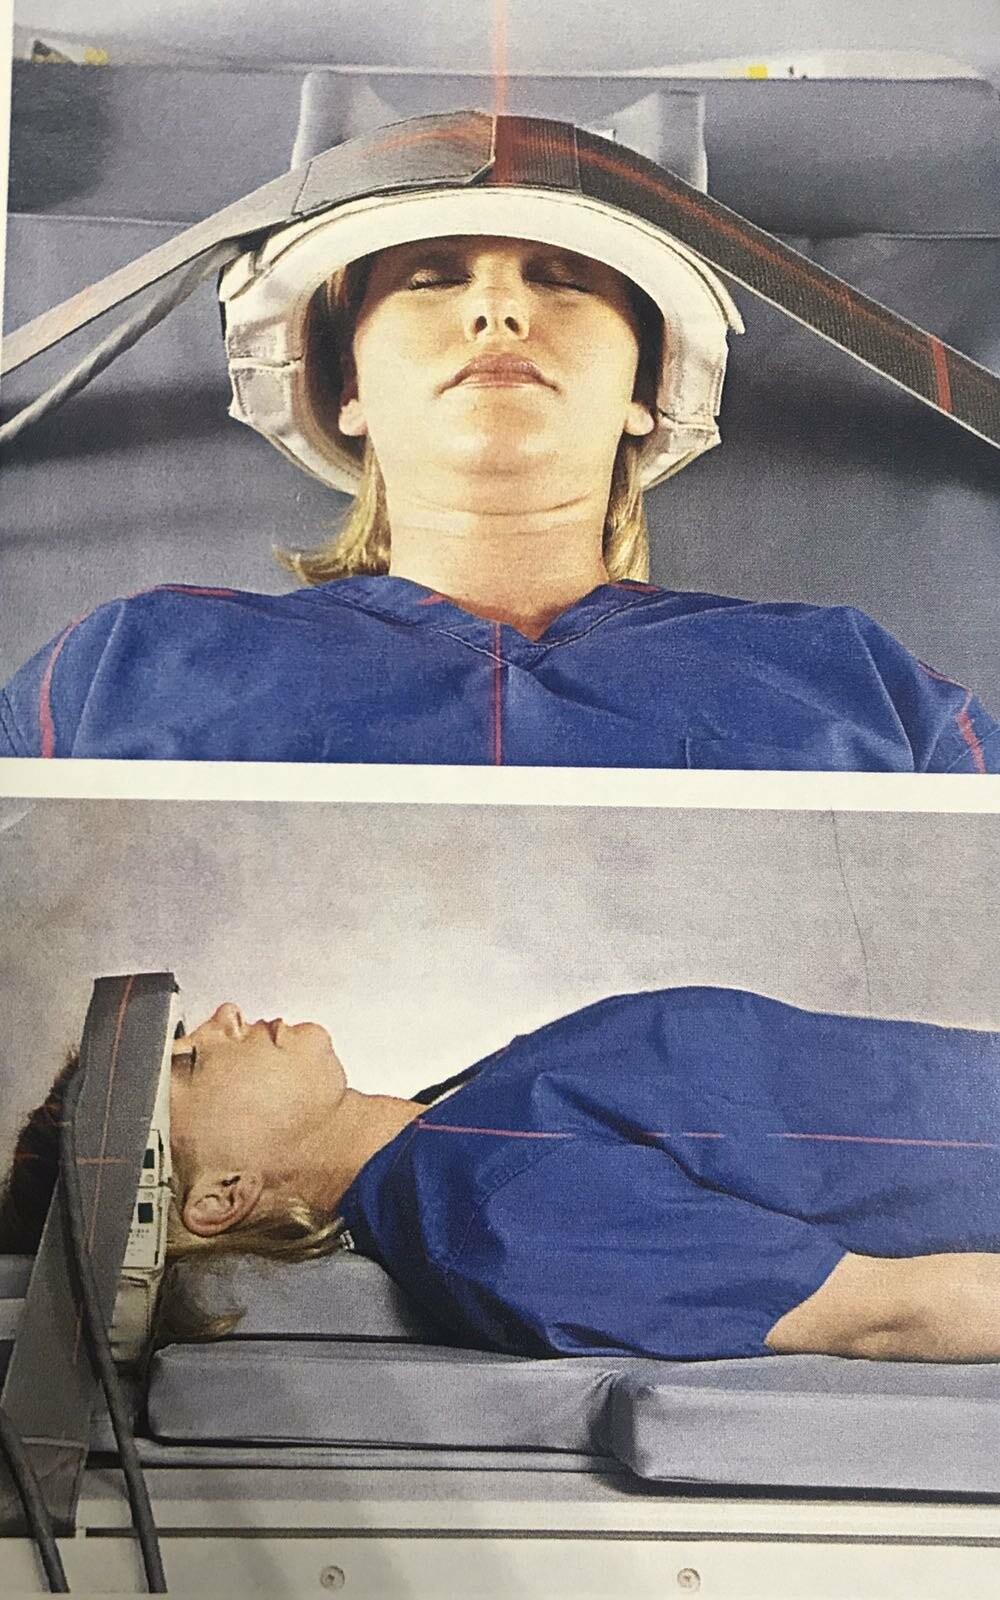 Магнитно-резонансная томография, Медицинский центр №1, фото-2